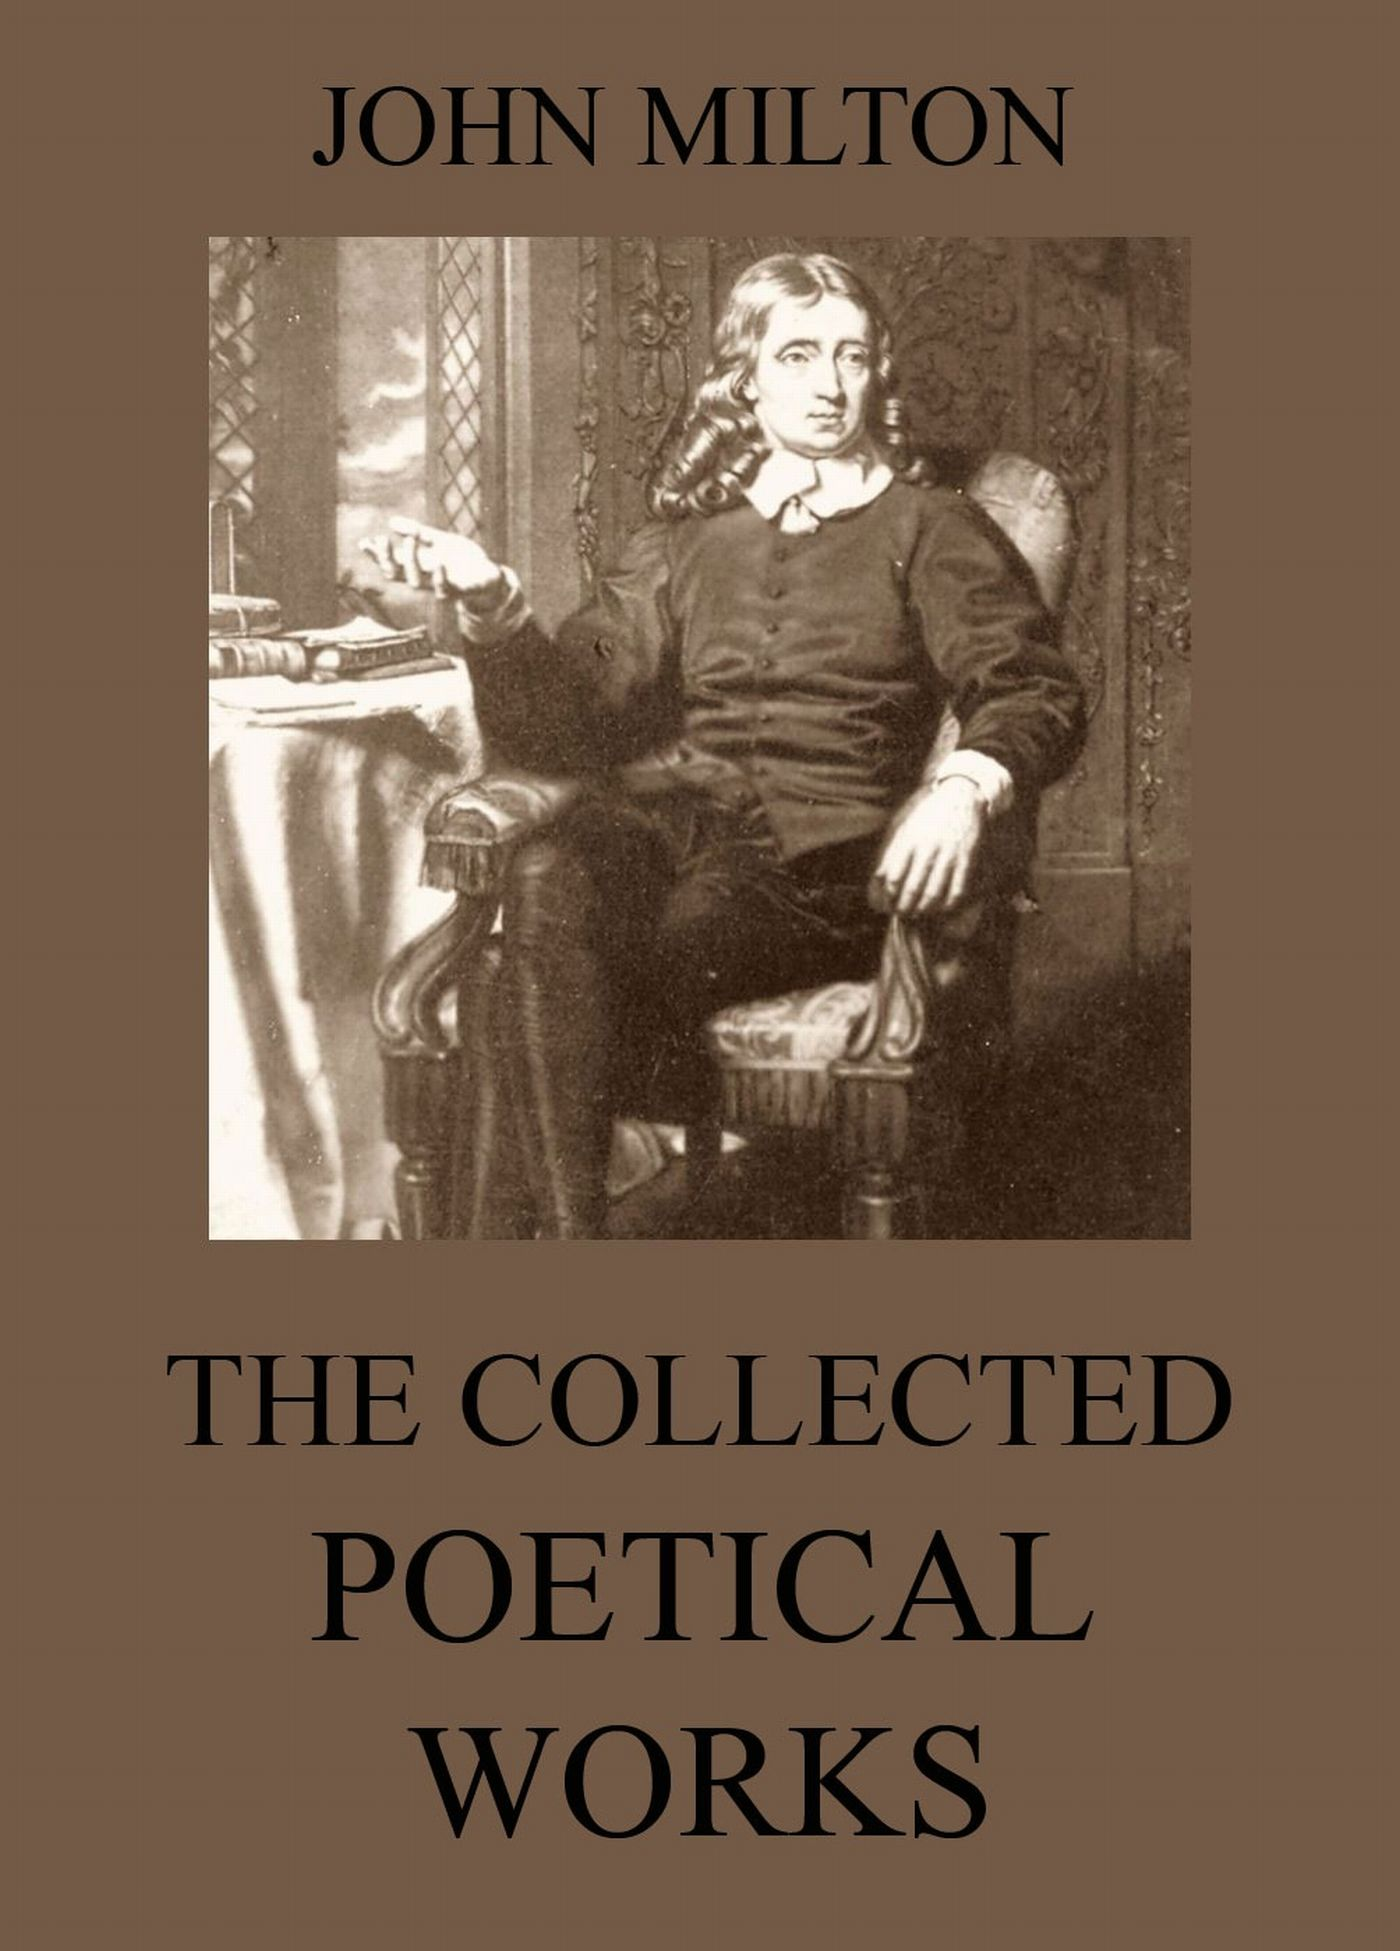 John Laws Milton The Collected Poetical Works of John Milton john milton paradise regained samson agonistes comus and arcades